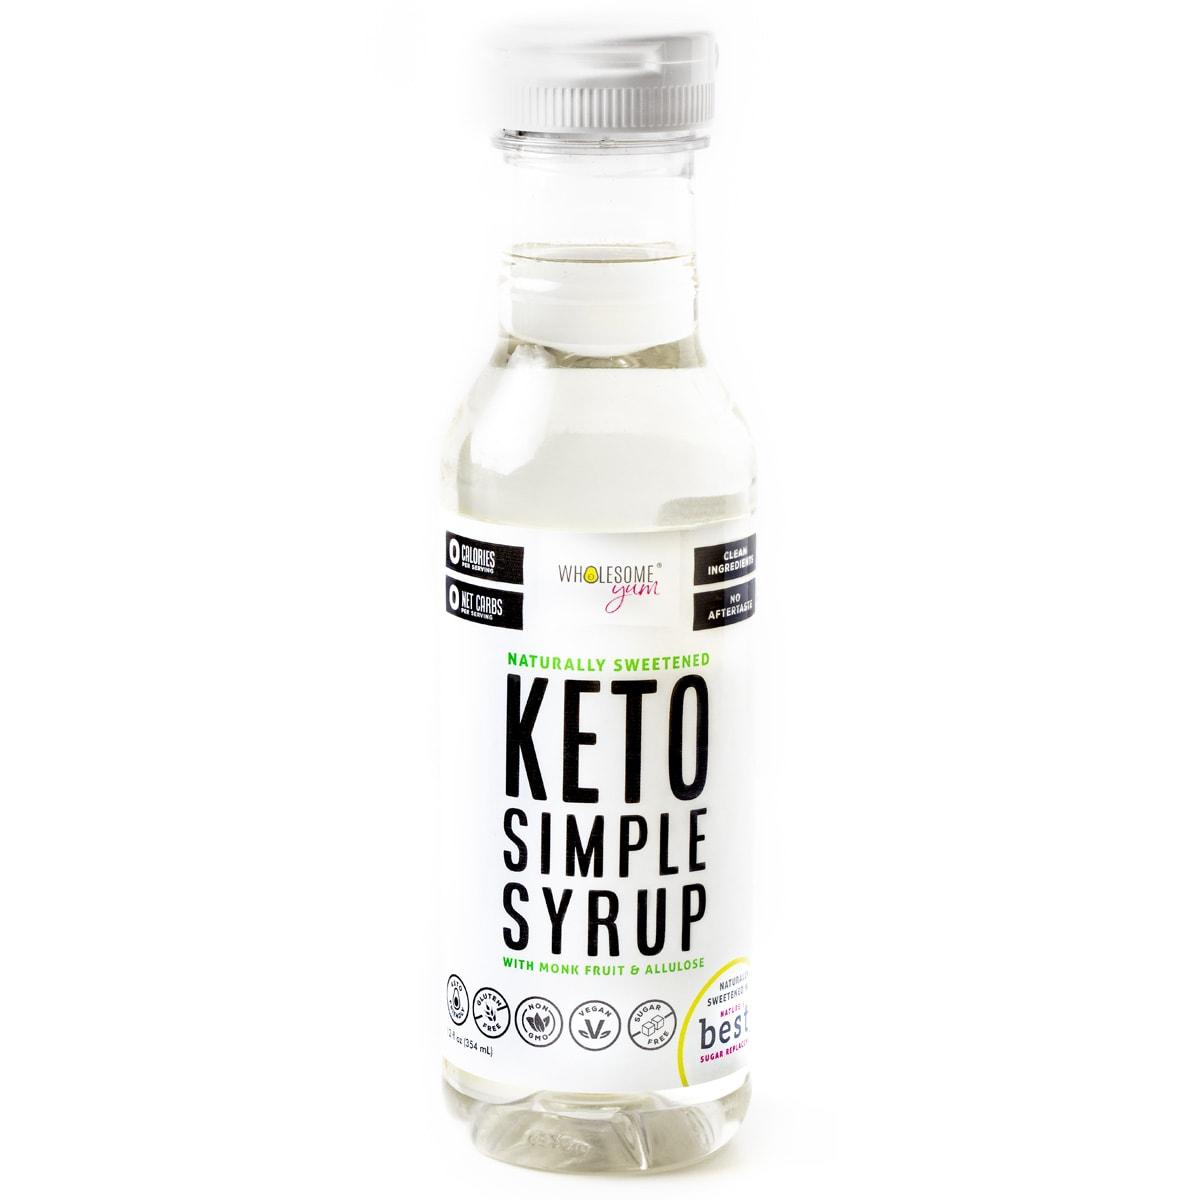 Wholesome Yum Sugar-Free Simple Syrup